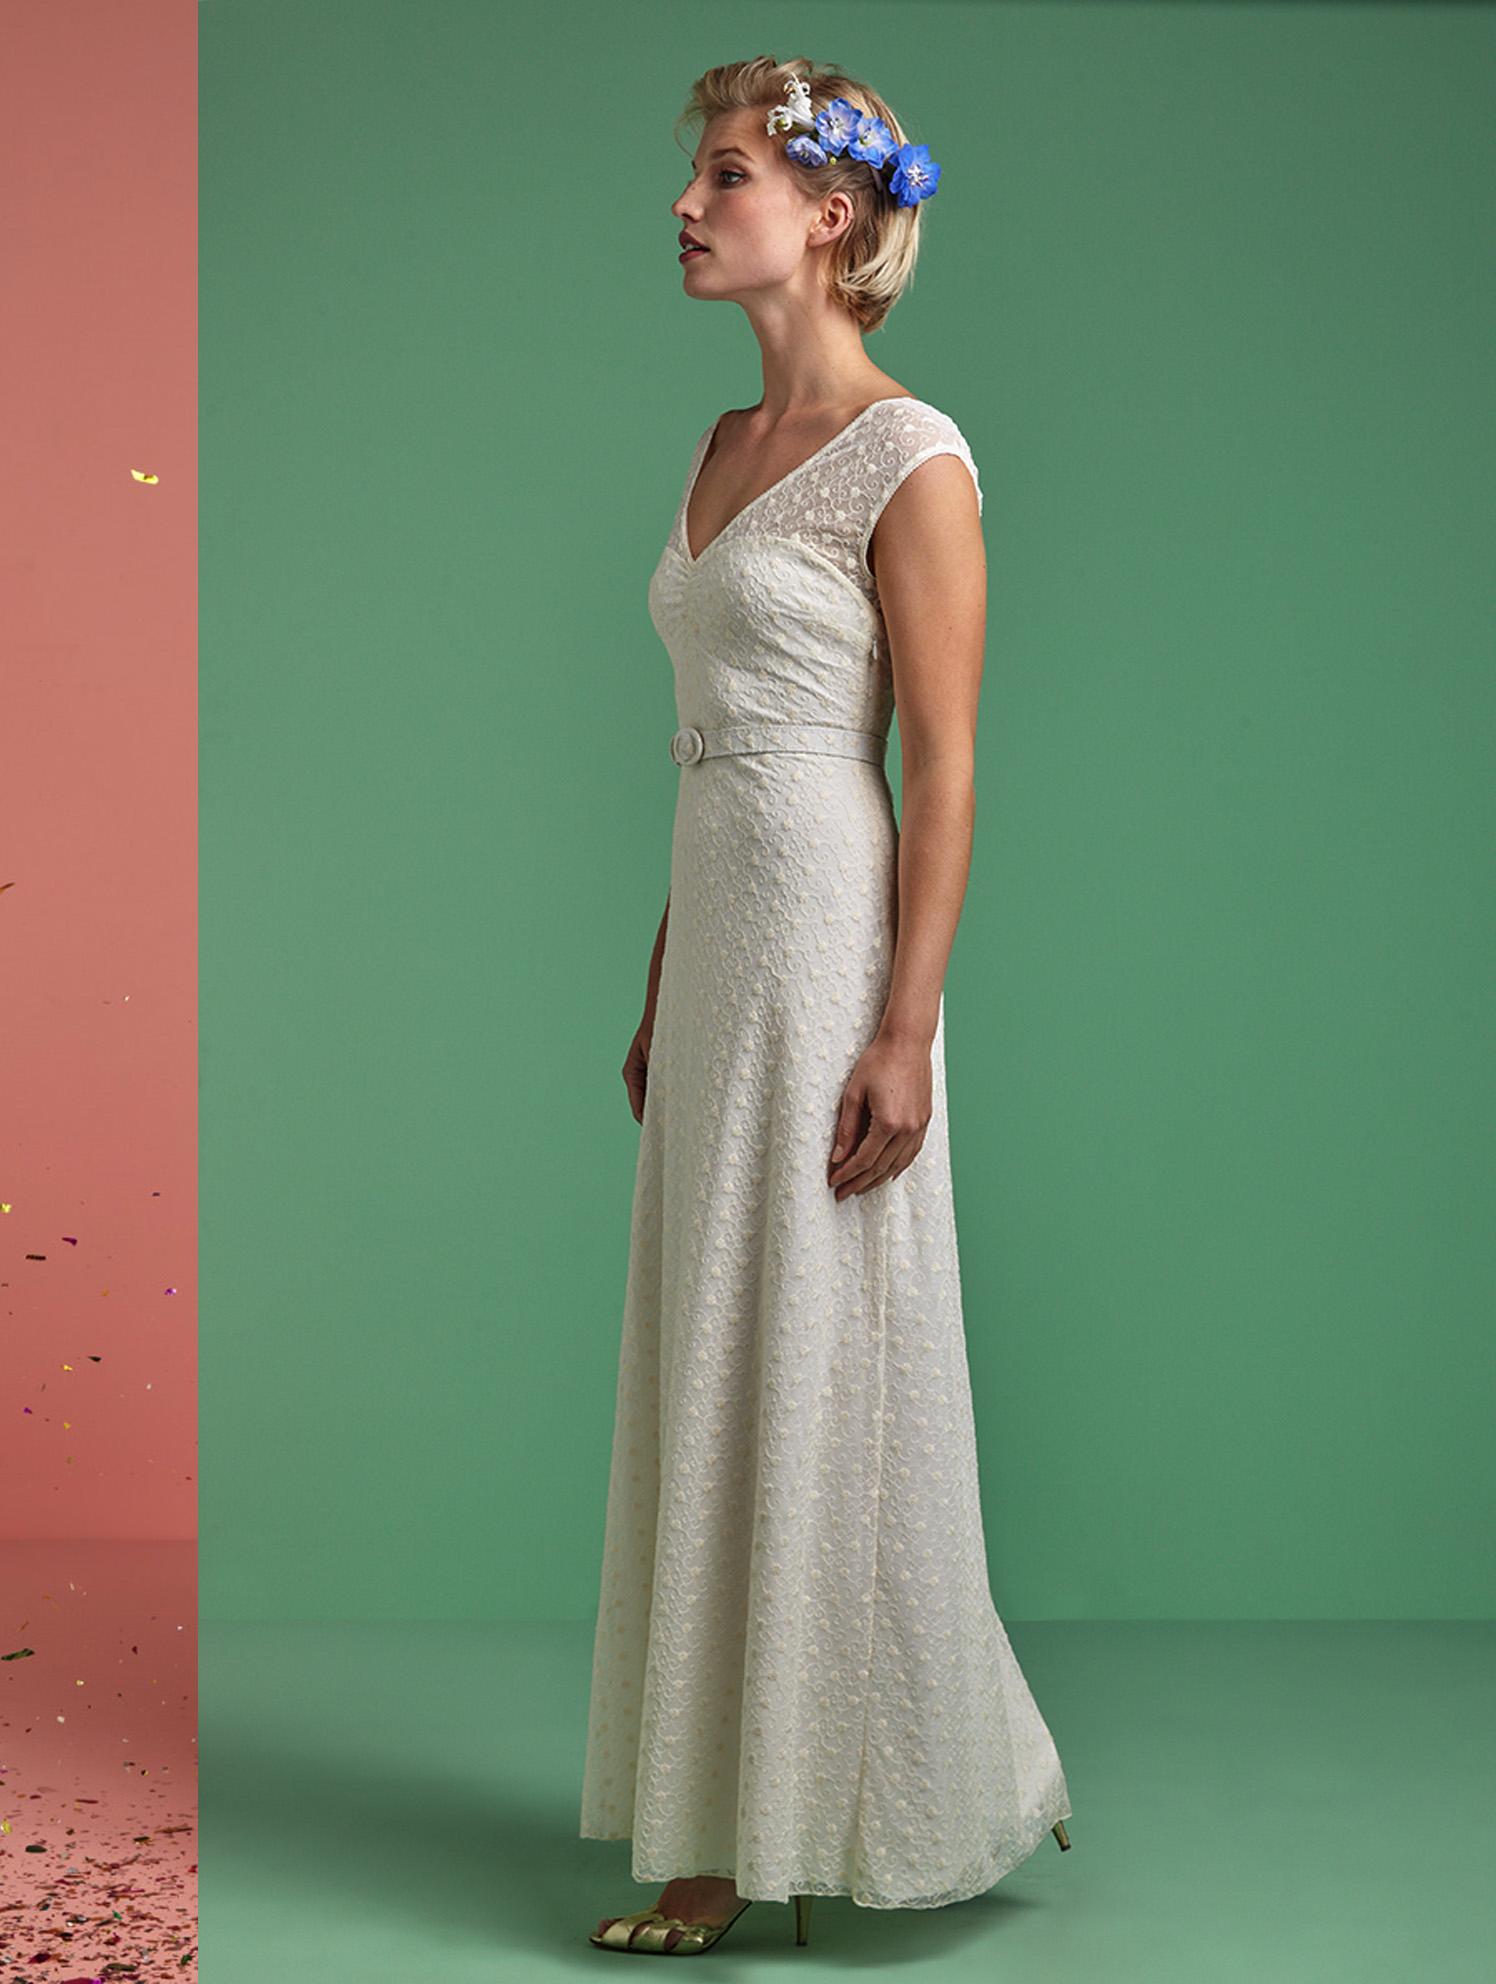 Ella Maxi Dress - Vintage inspiriertes Brautkleid